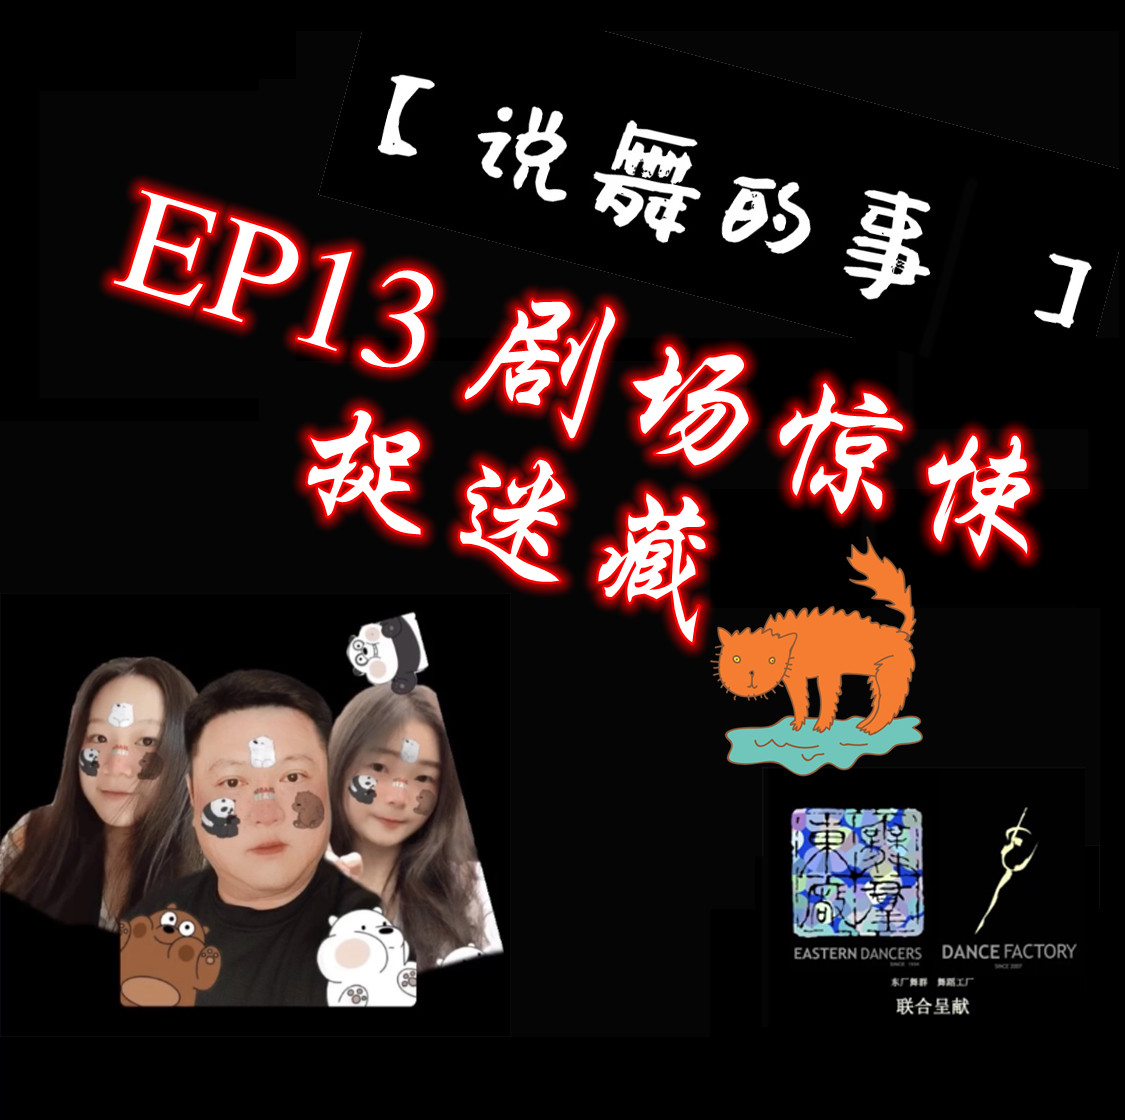 EP13 剧场惊悚 捉迷藏